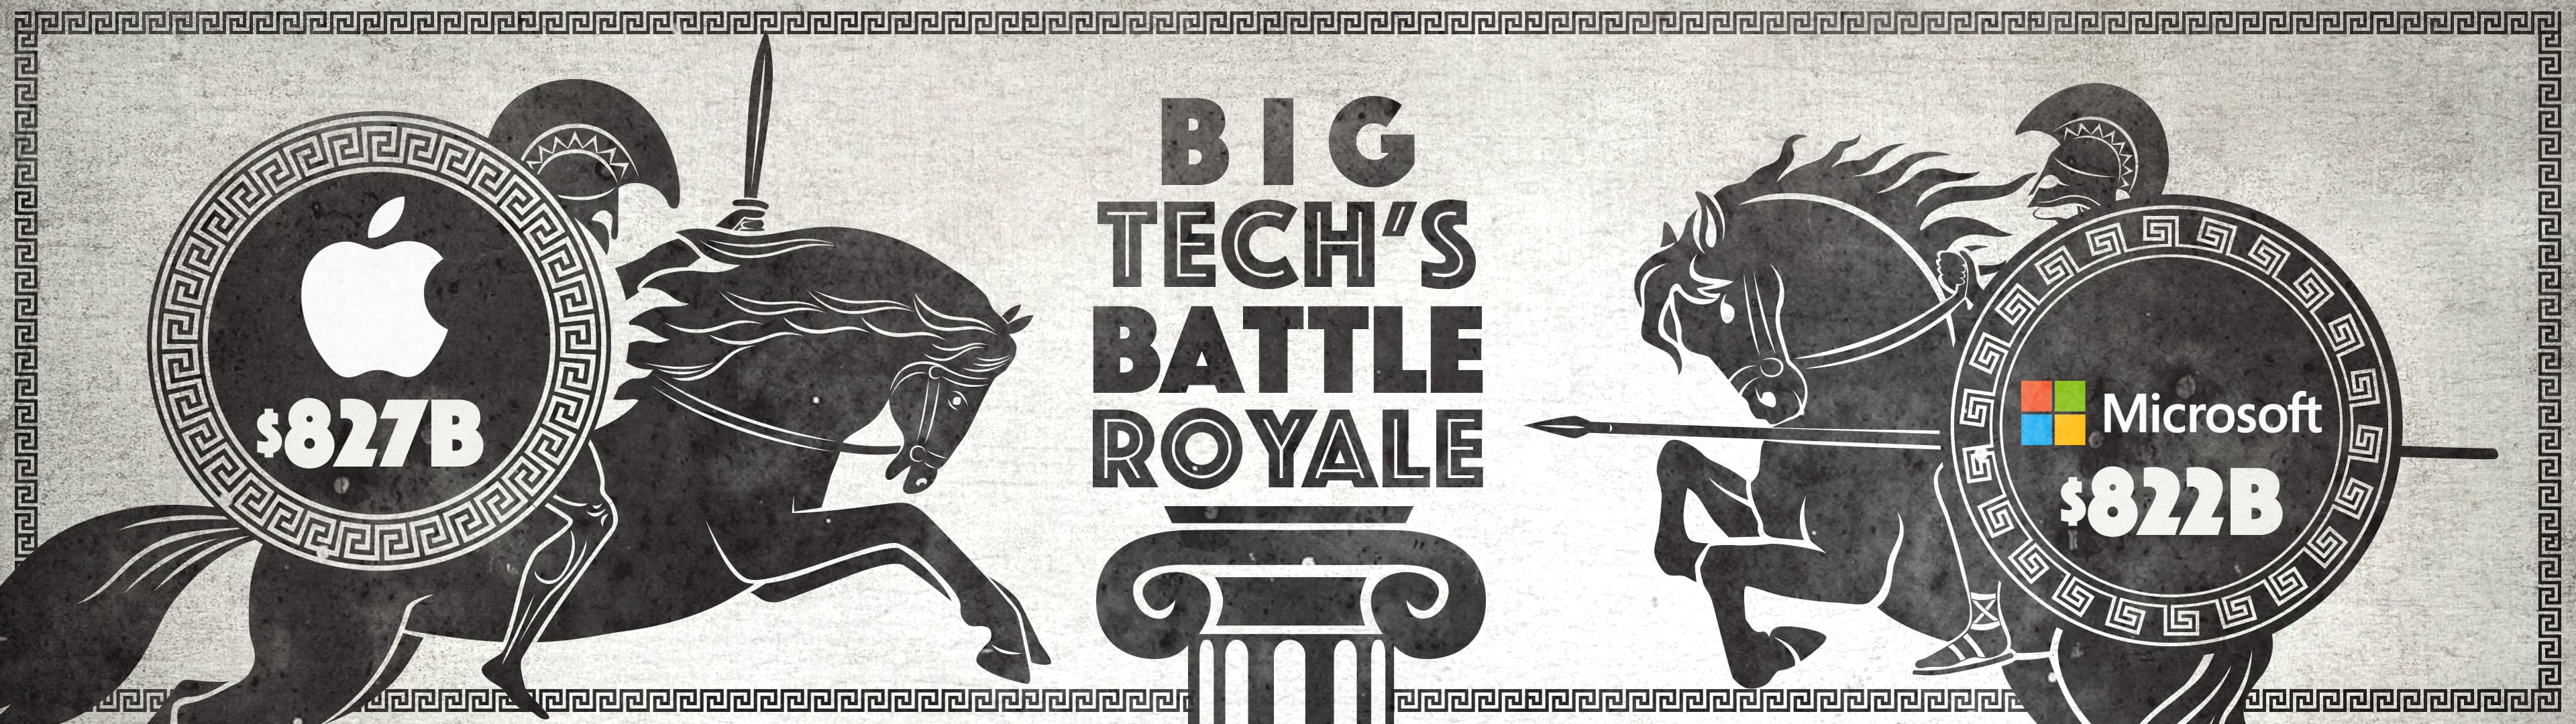 Big Tech Battle Royale Apple vs Microsoft